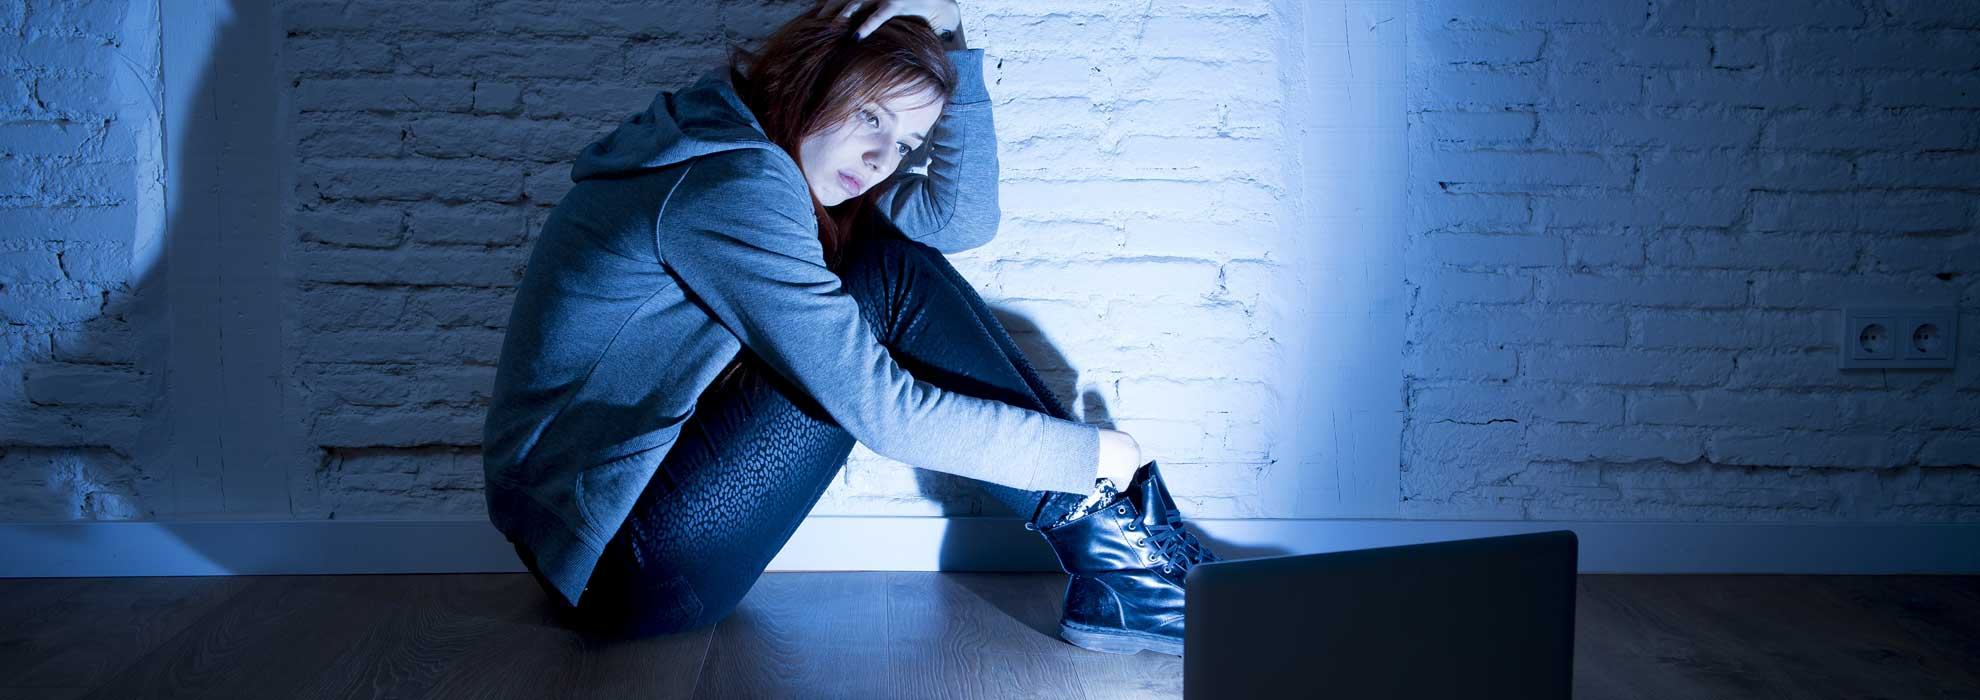 Digital Private Investigators   Infidelity Investigations